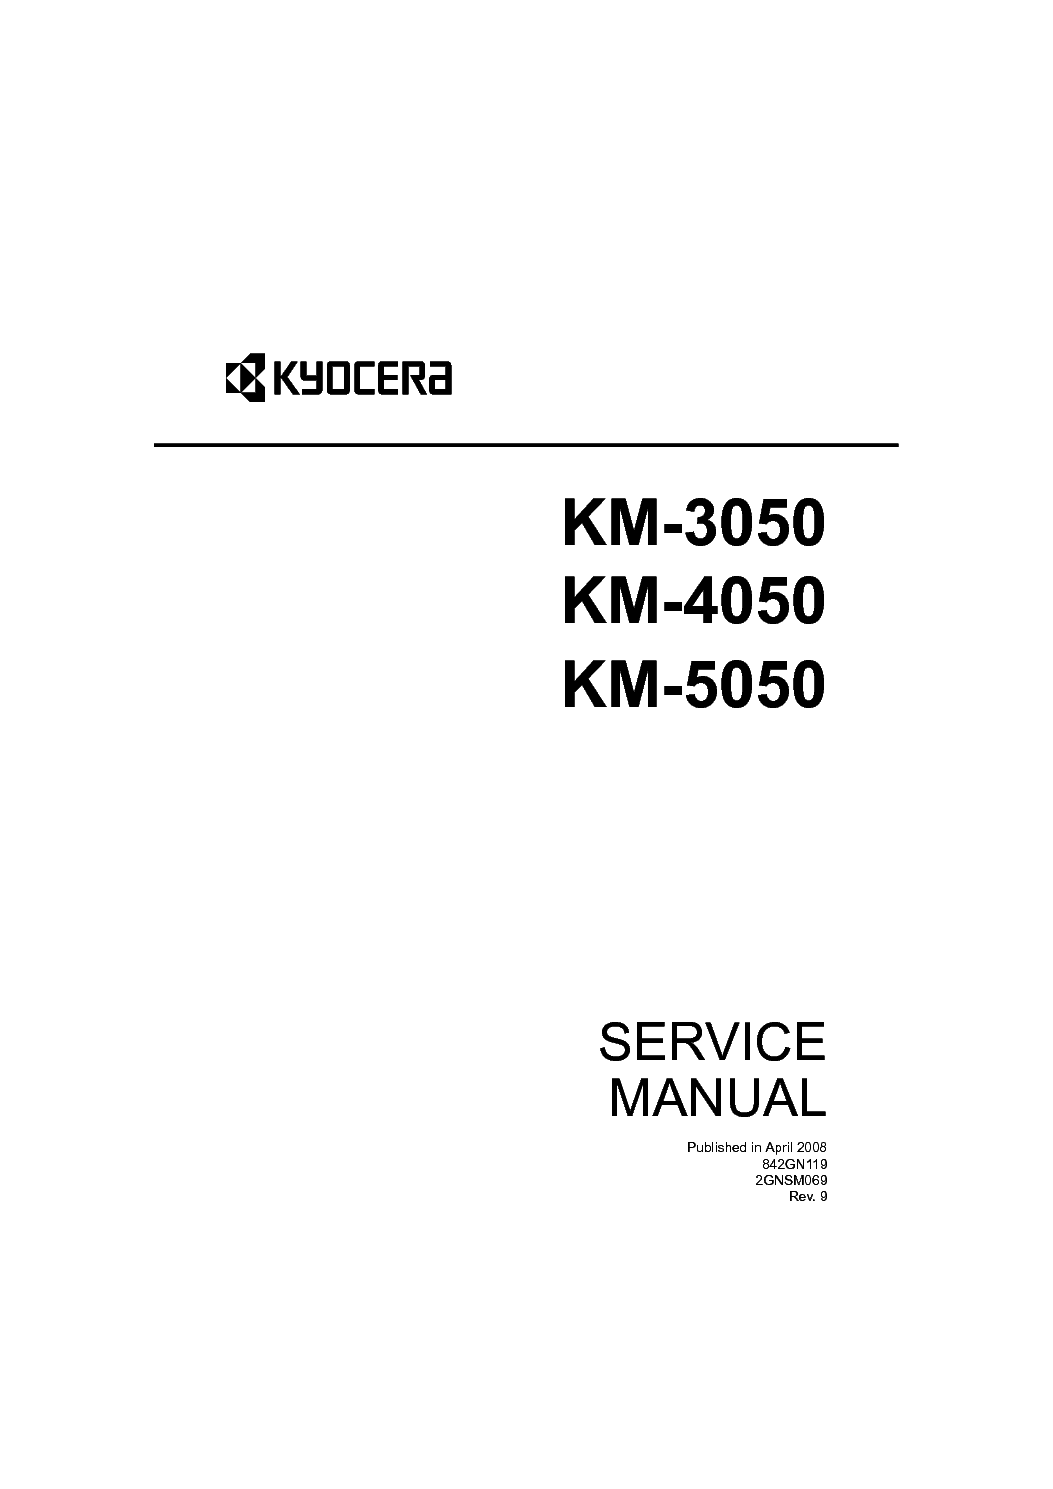 Kyocera 4035 service manual